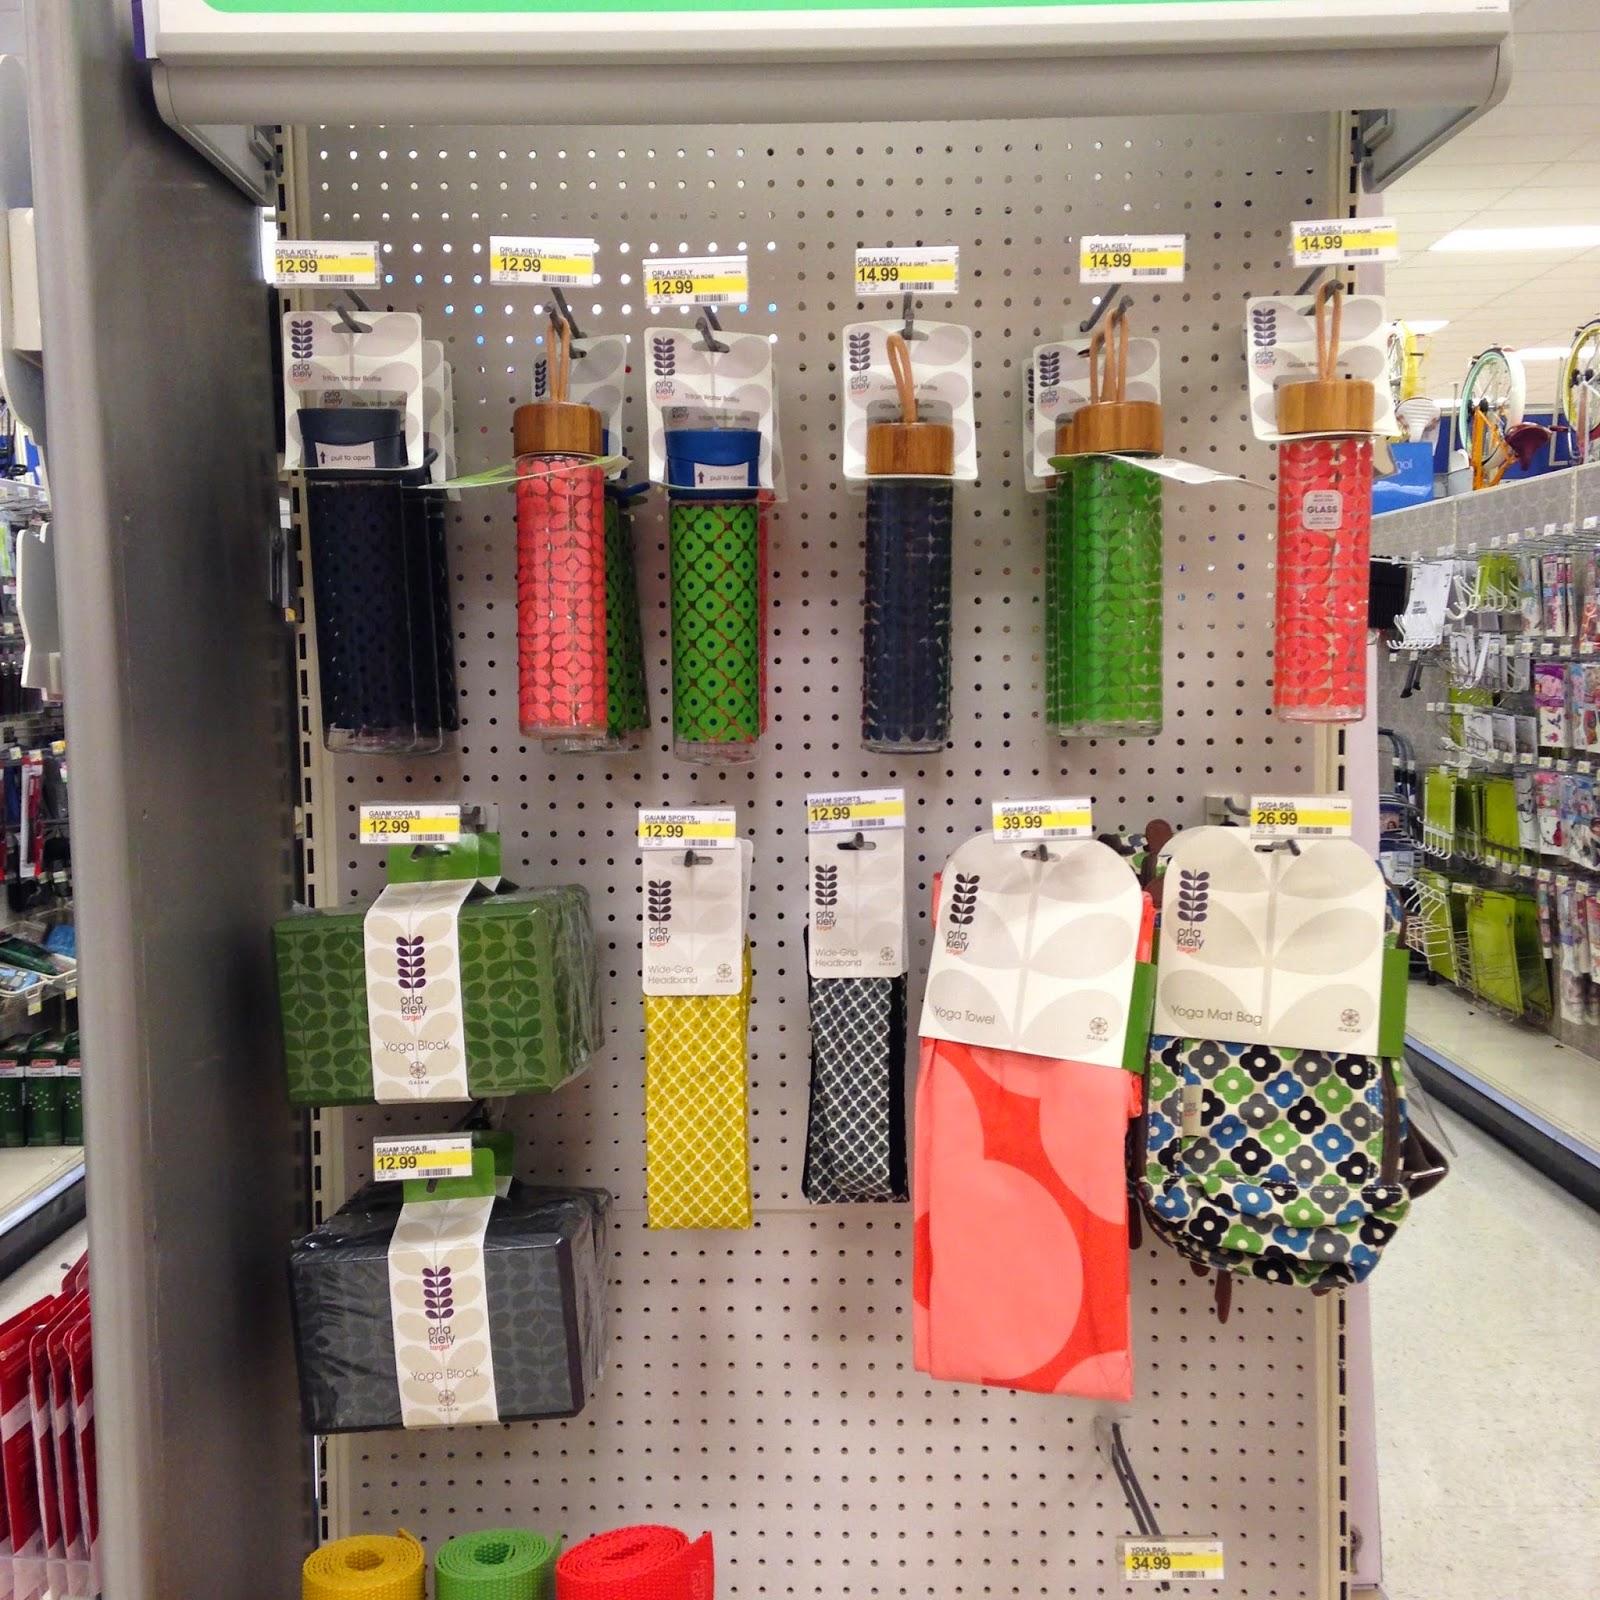 I Love Orla Kiely Orla Kiely By Gaiam Yoga Items At Target